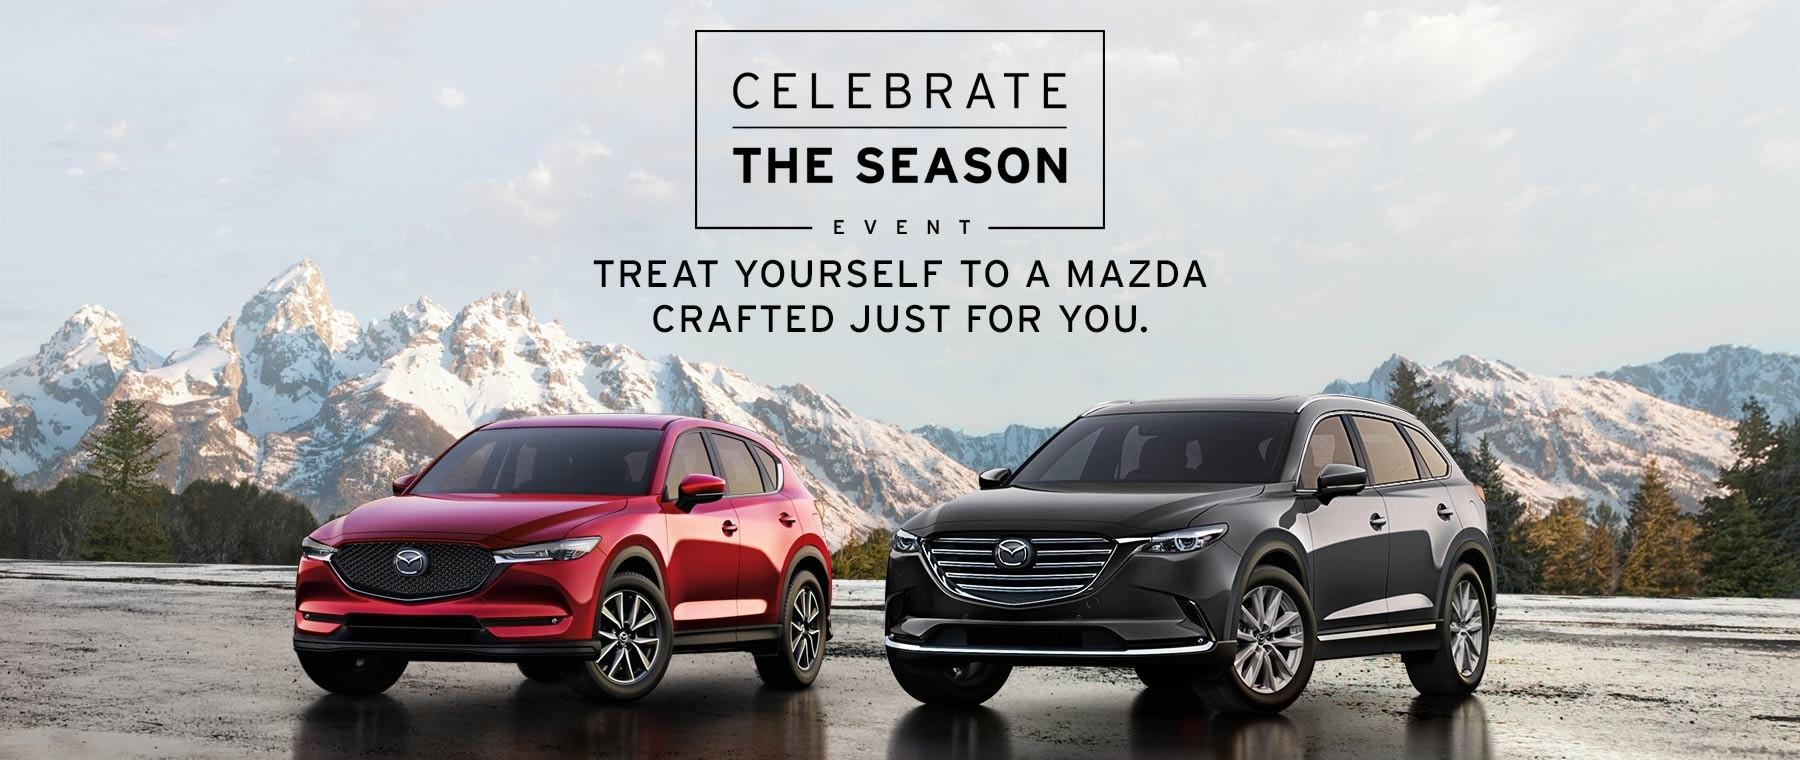 celebrate-the-season